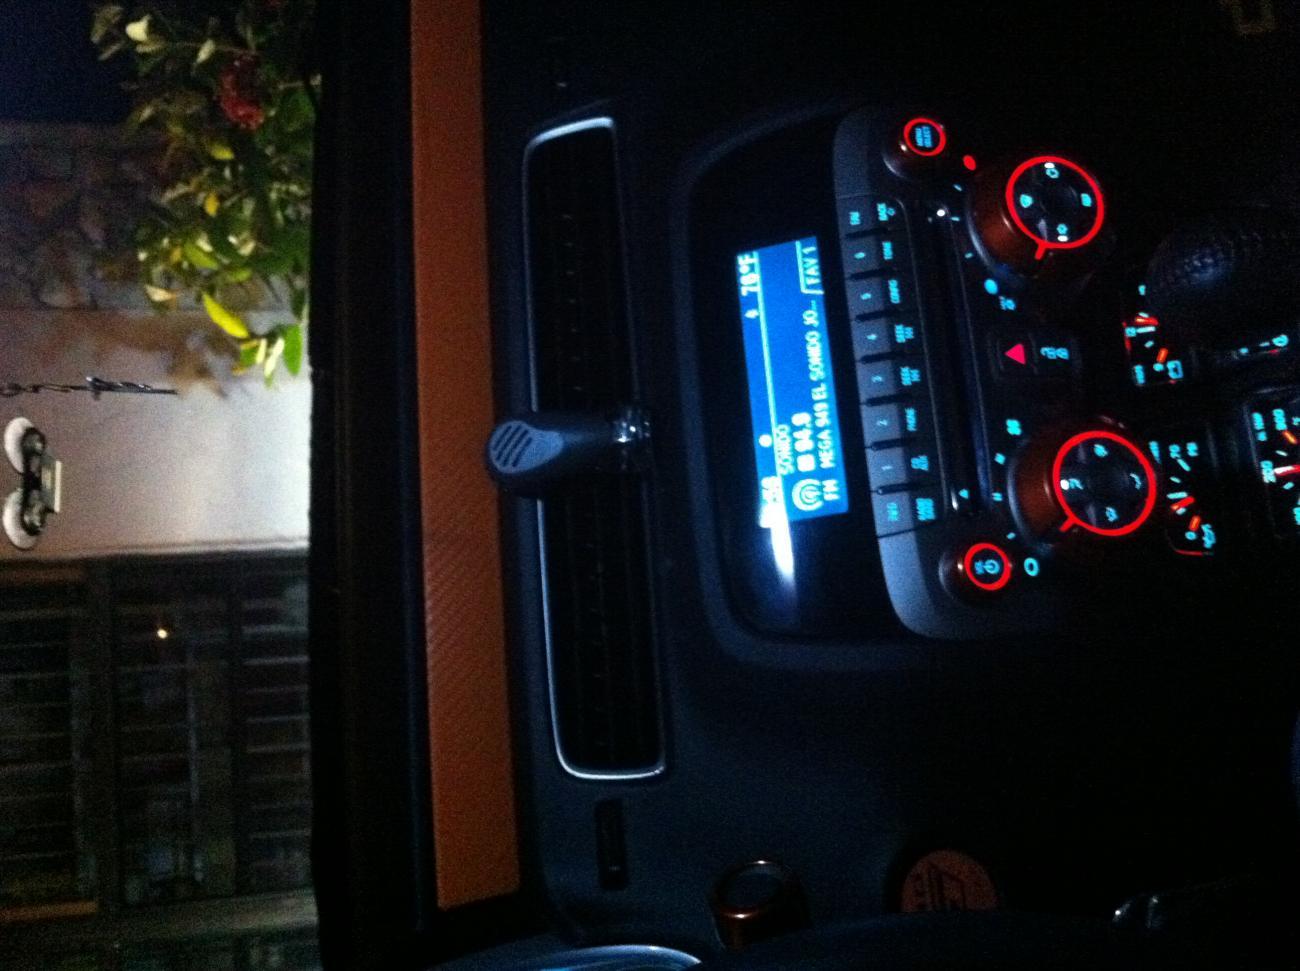 2011 Camaro Interior Trim Kit 4 Pieces For Sale Camaro5 Chevy Camaro Forum Camaro Zl1 Ss